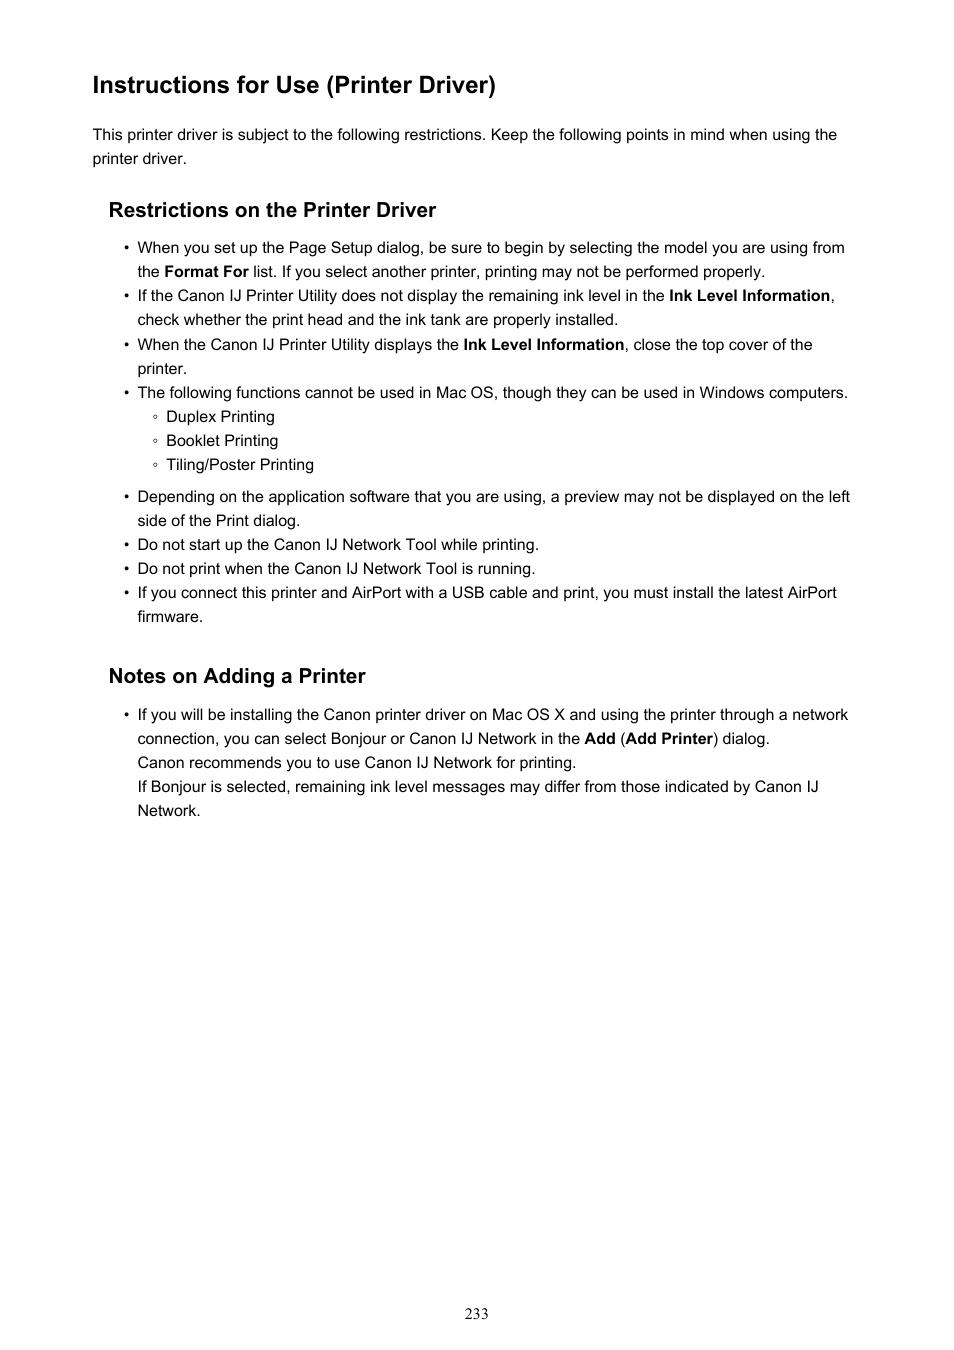 Instructions for use (printer driver) | Canon PIXMA iX6850